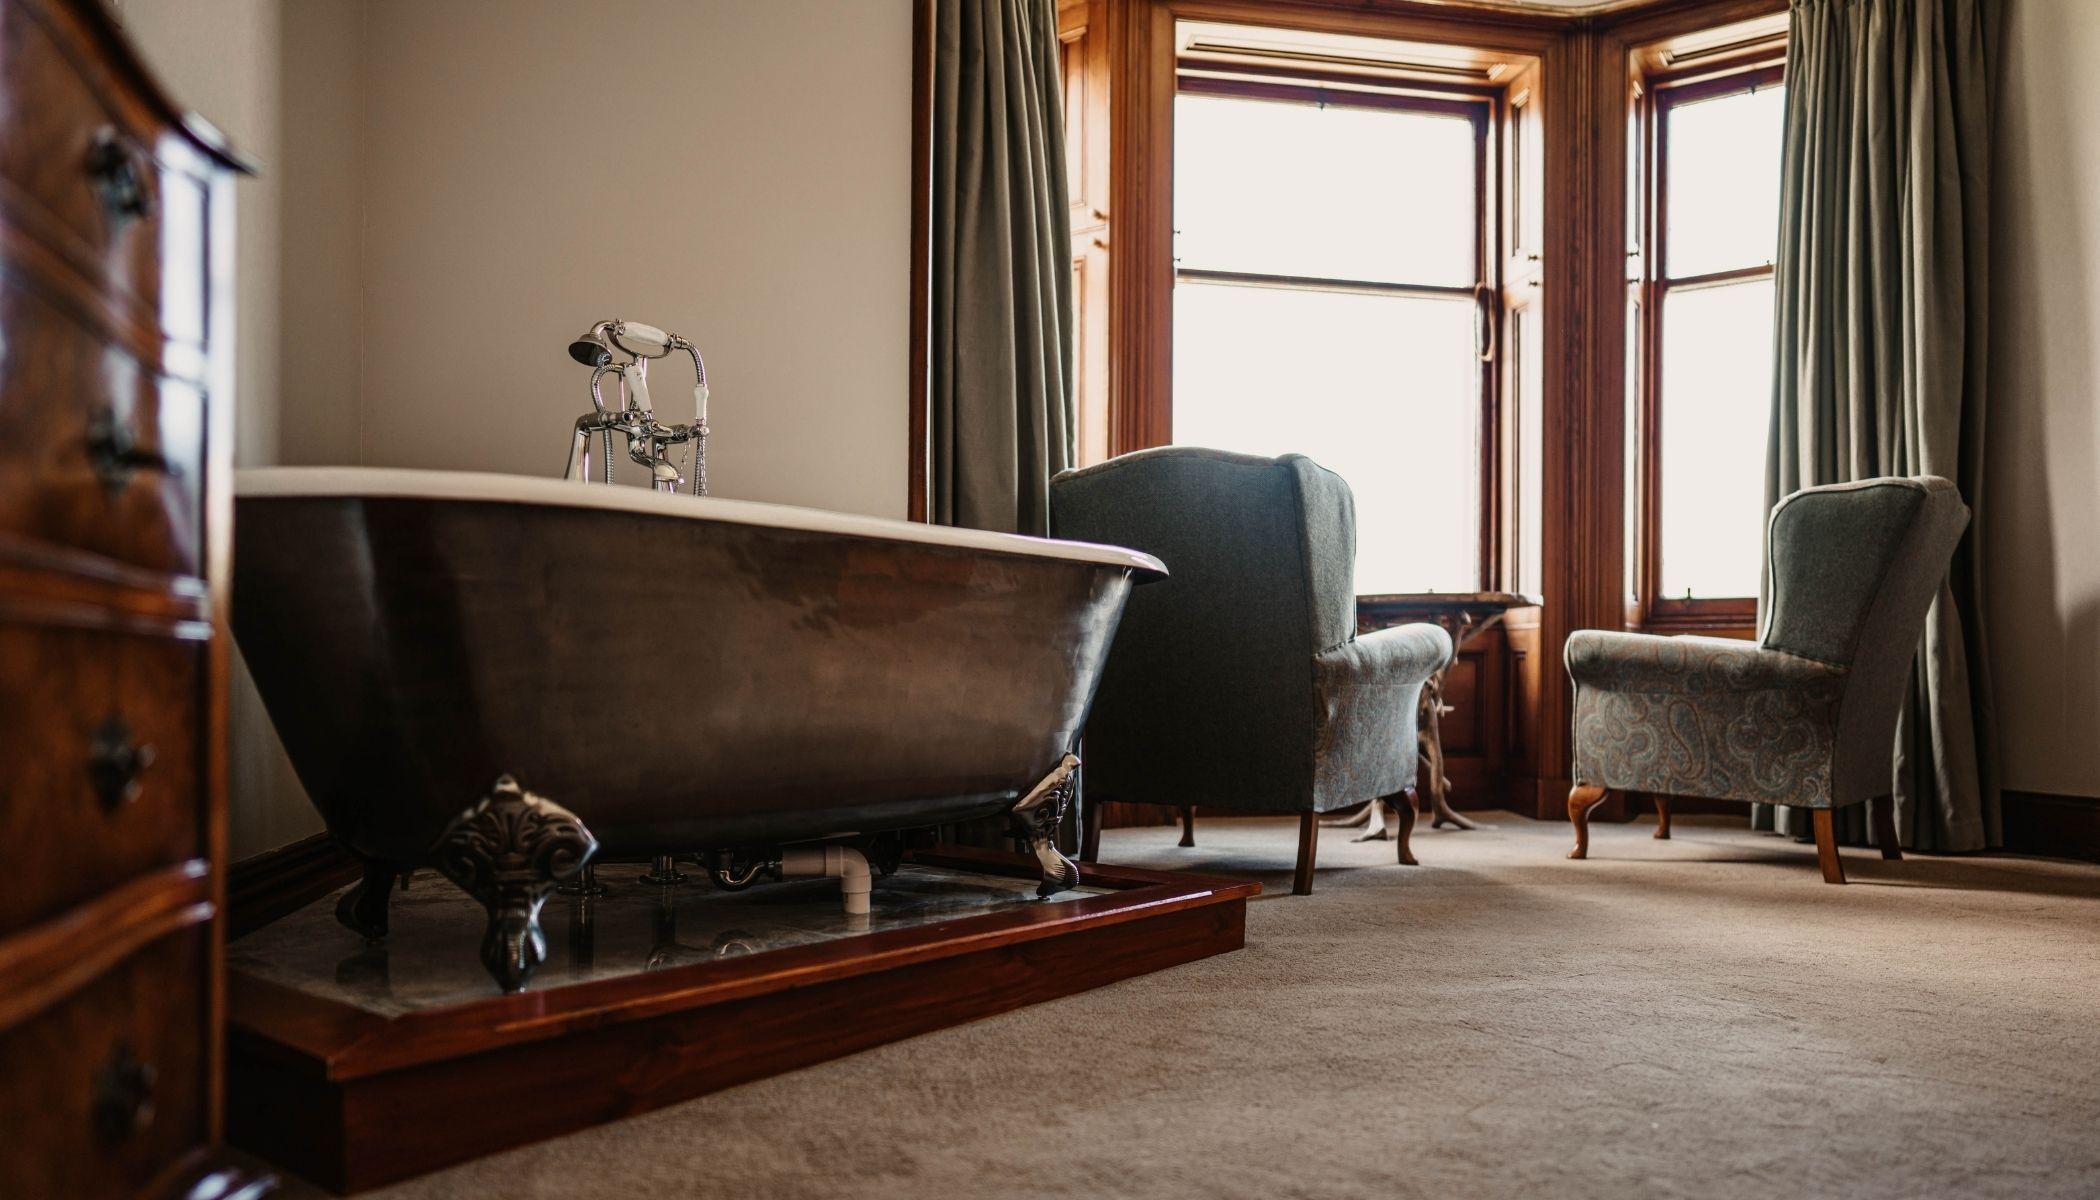 Bath tub in Suite